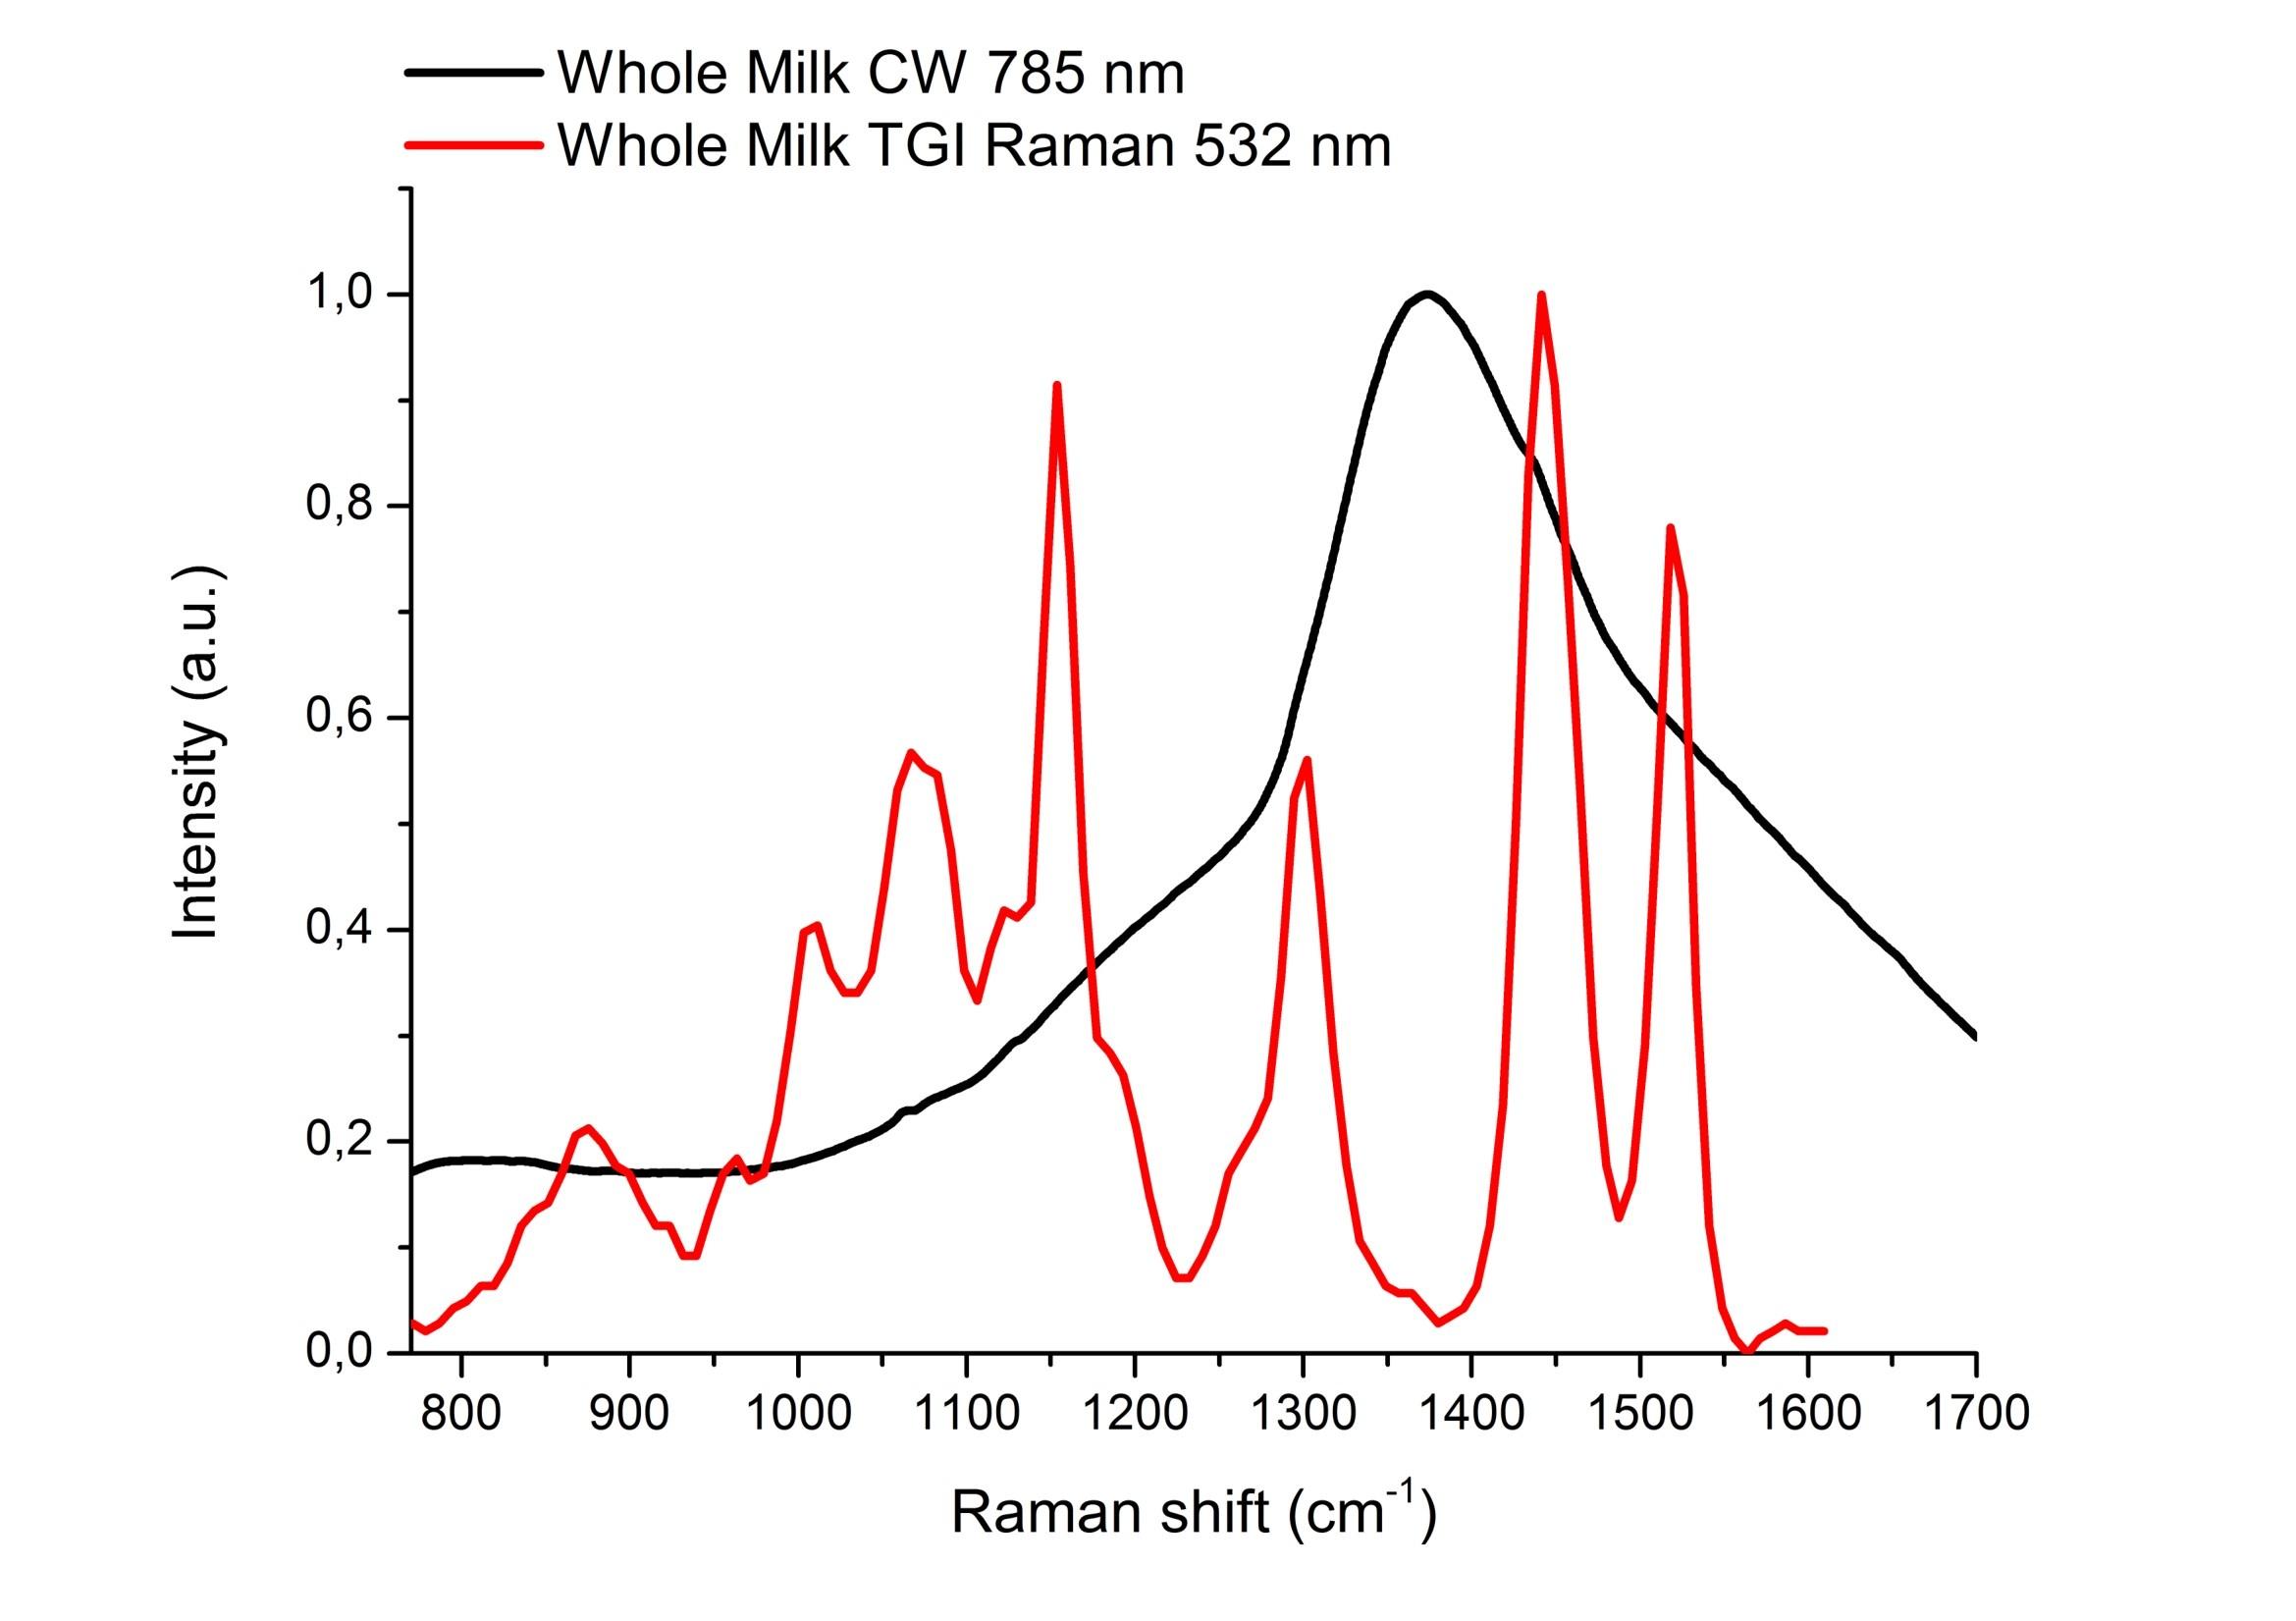 1_Whole_milk_spectra